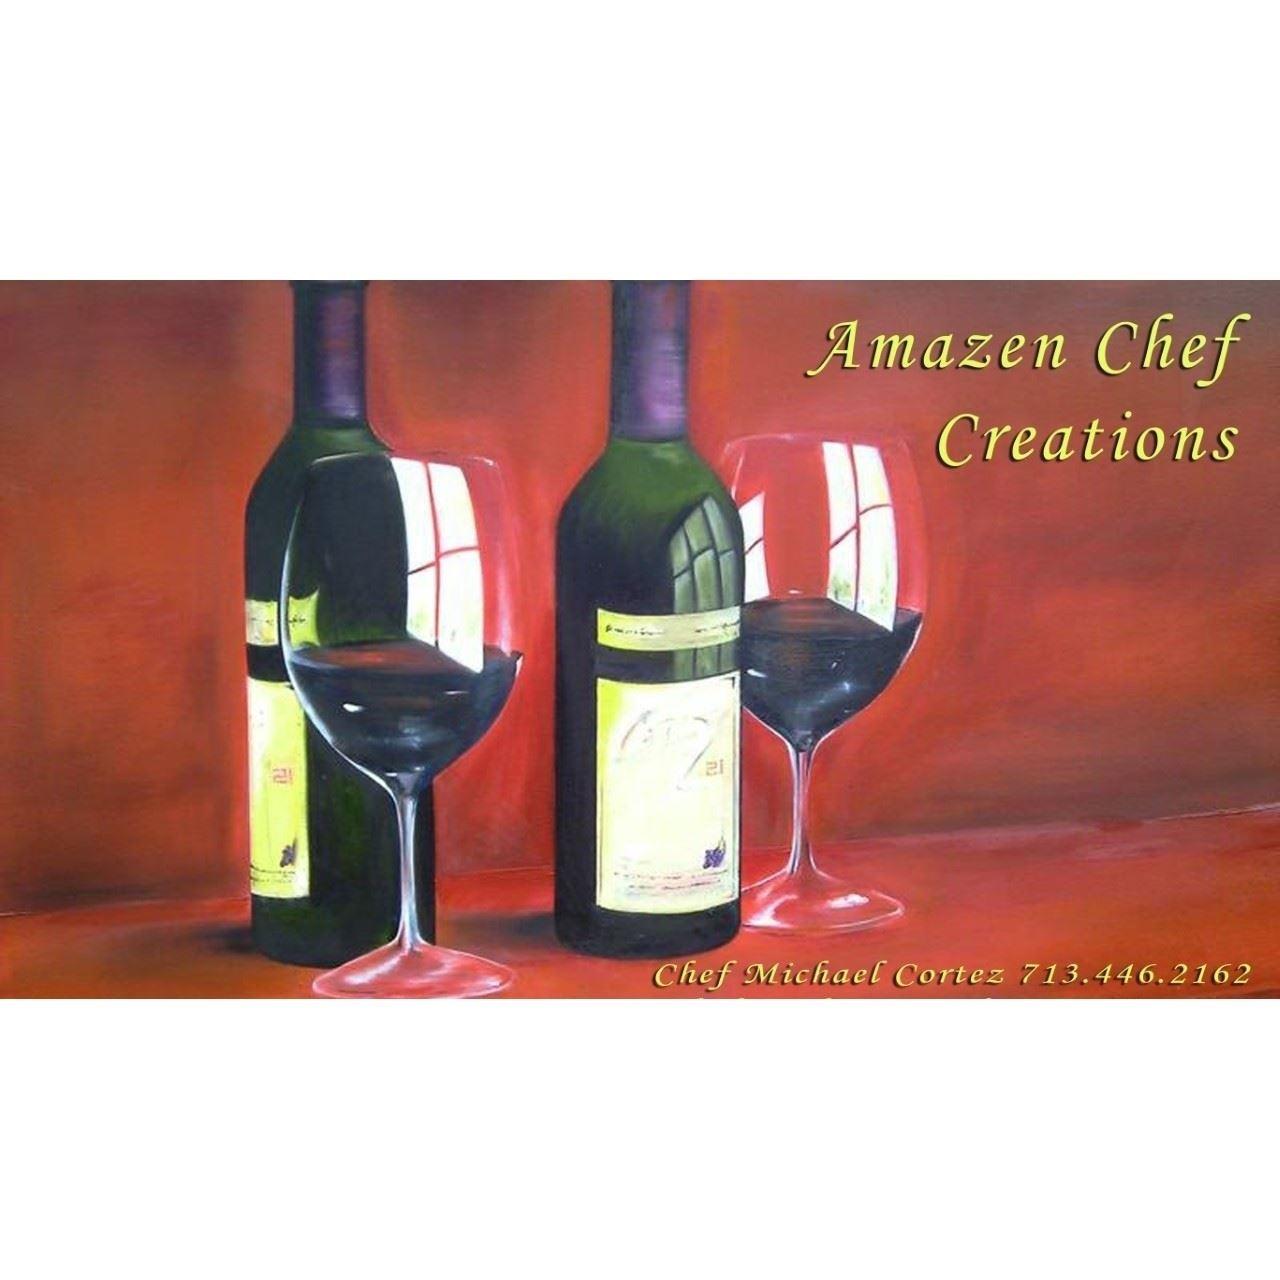 Amazen Chef Creations